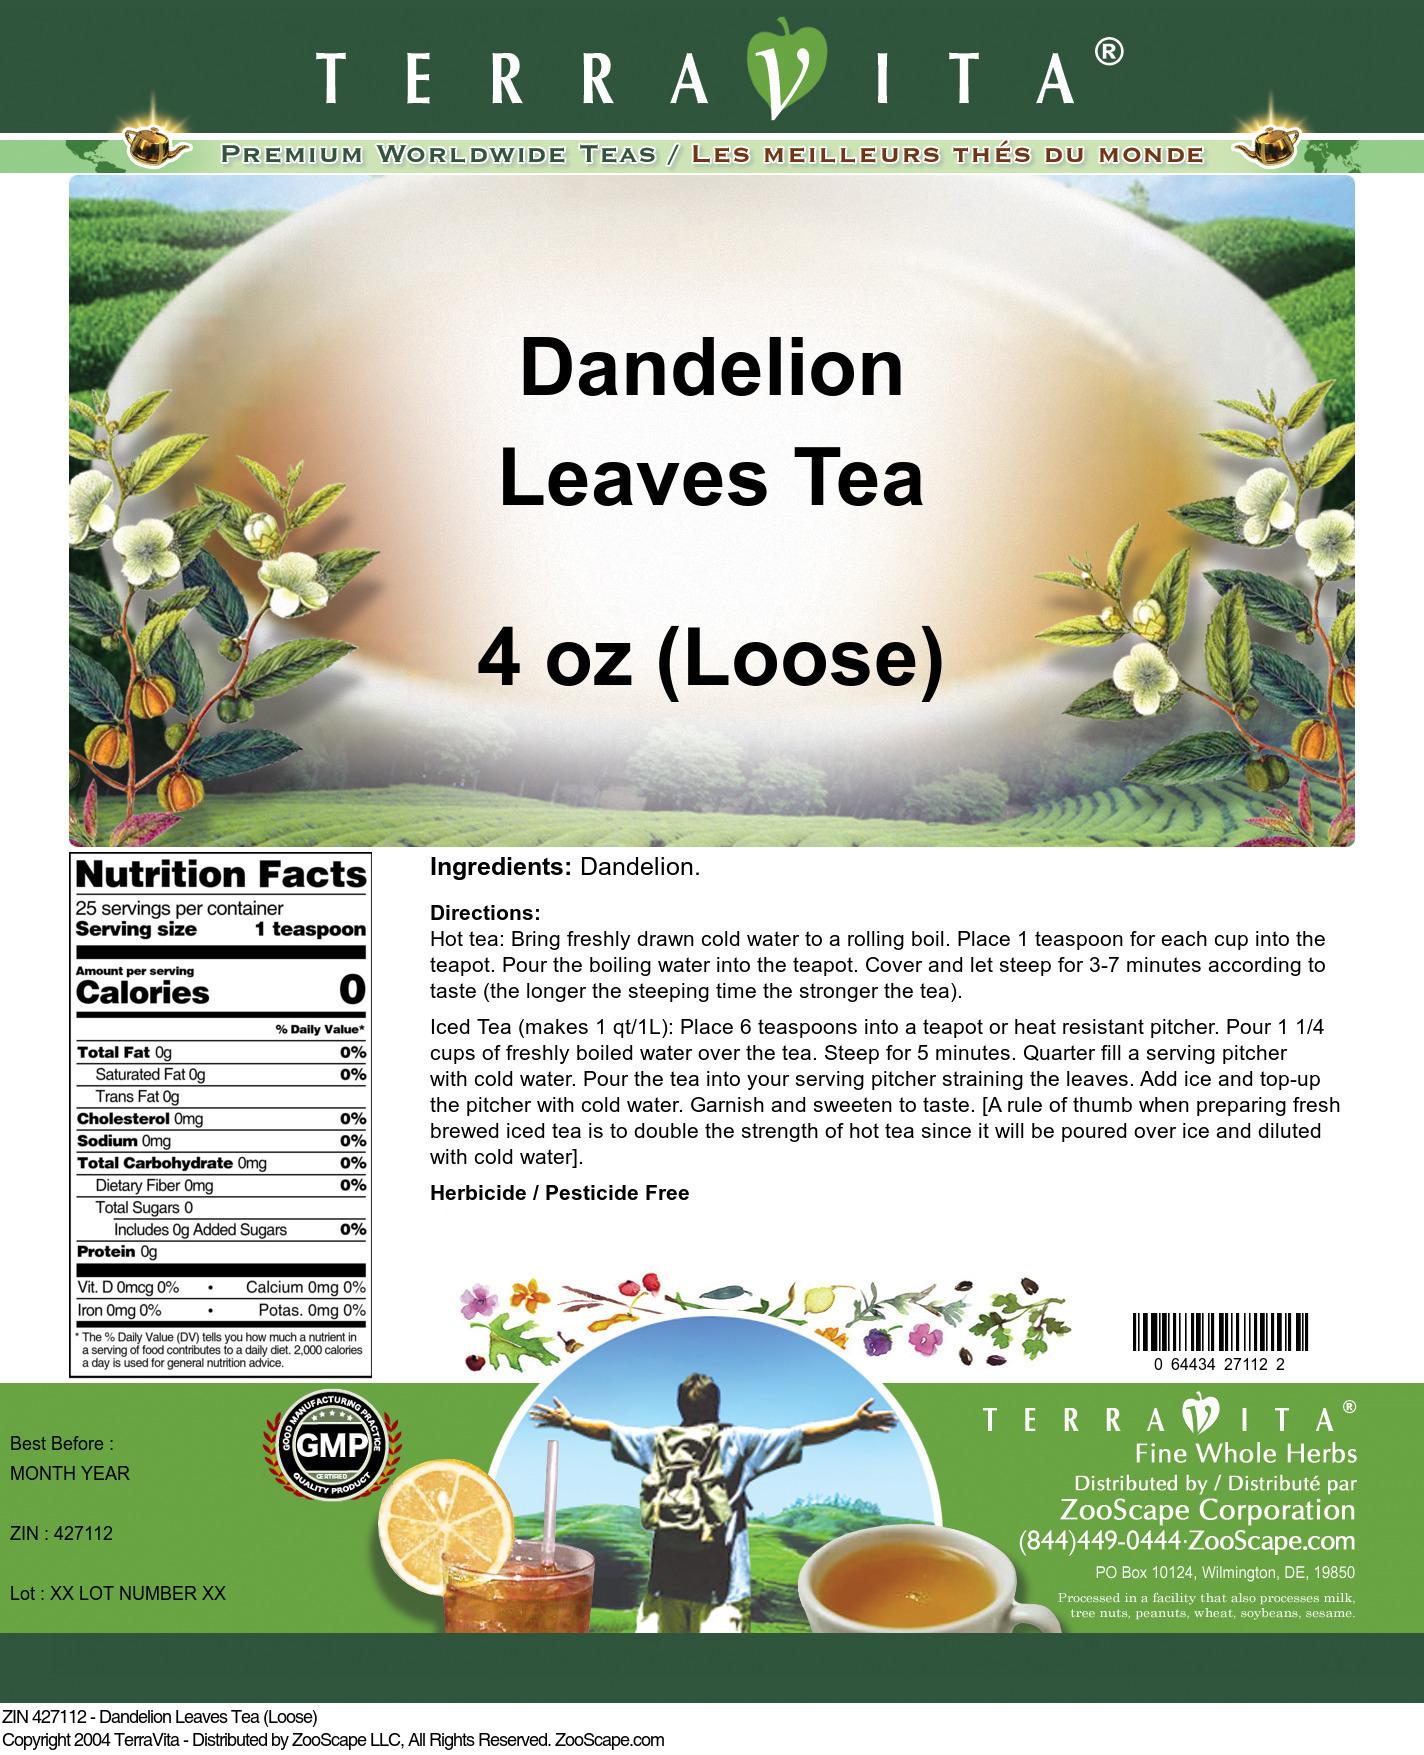 Dandelion Leaves Tea (Loose) - Label